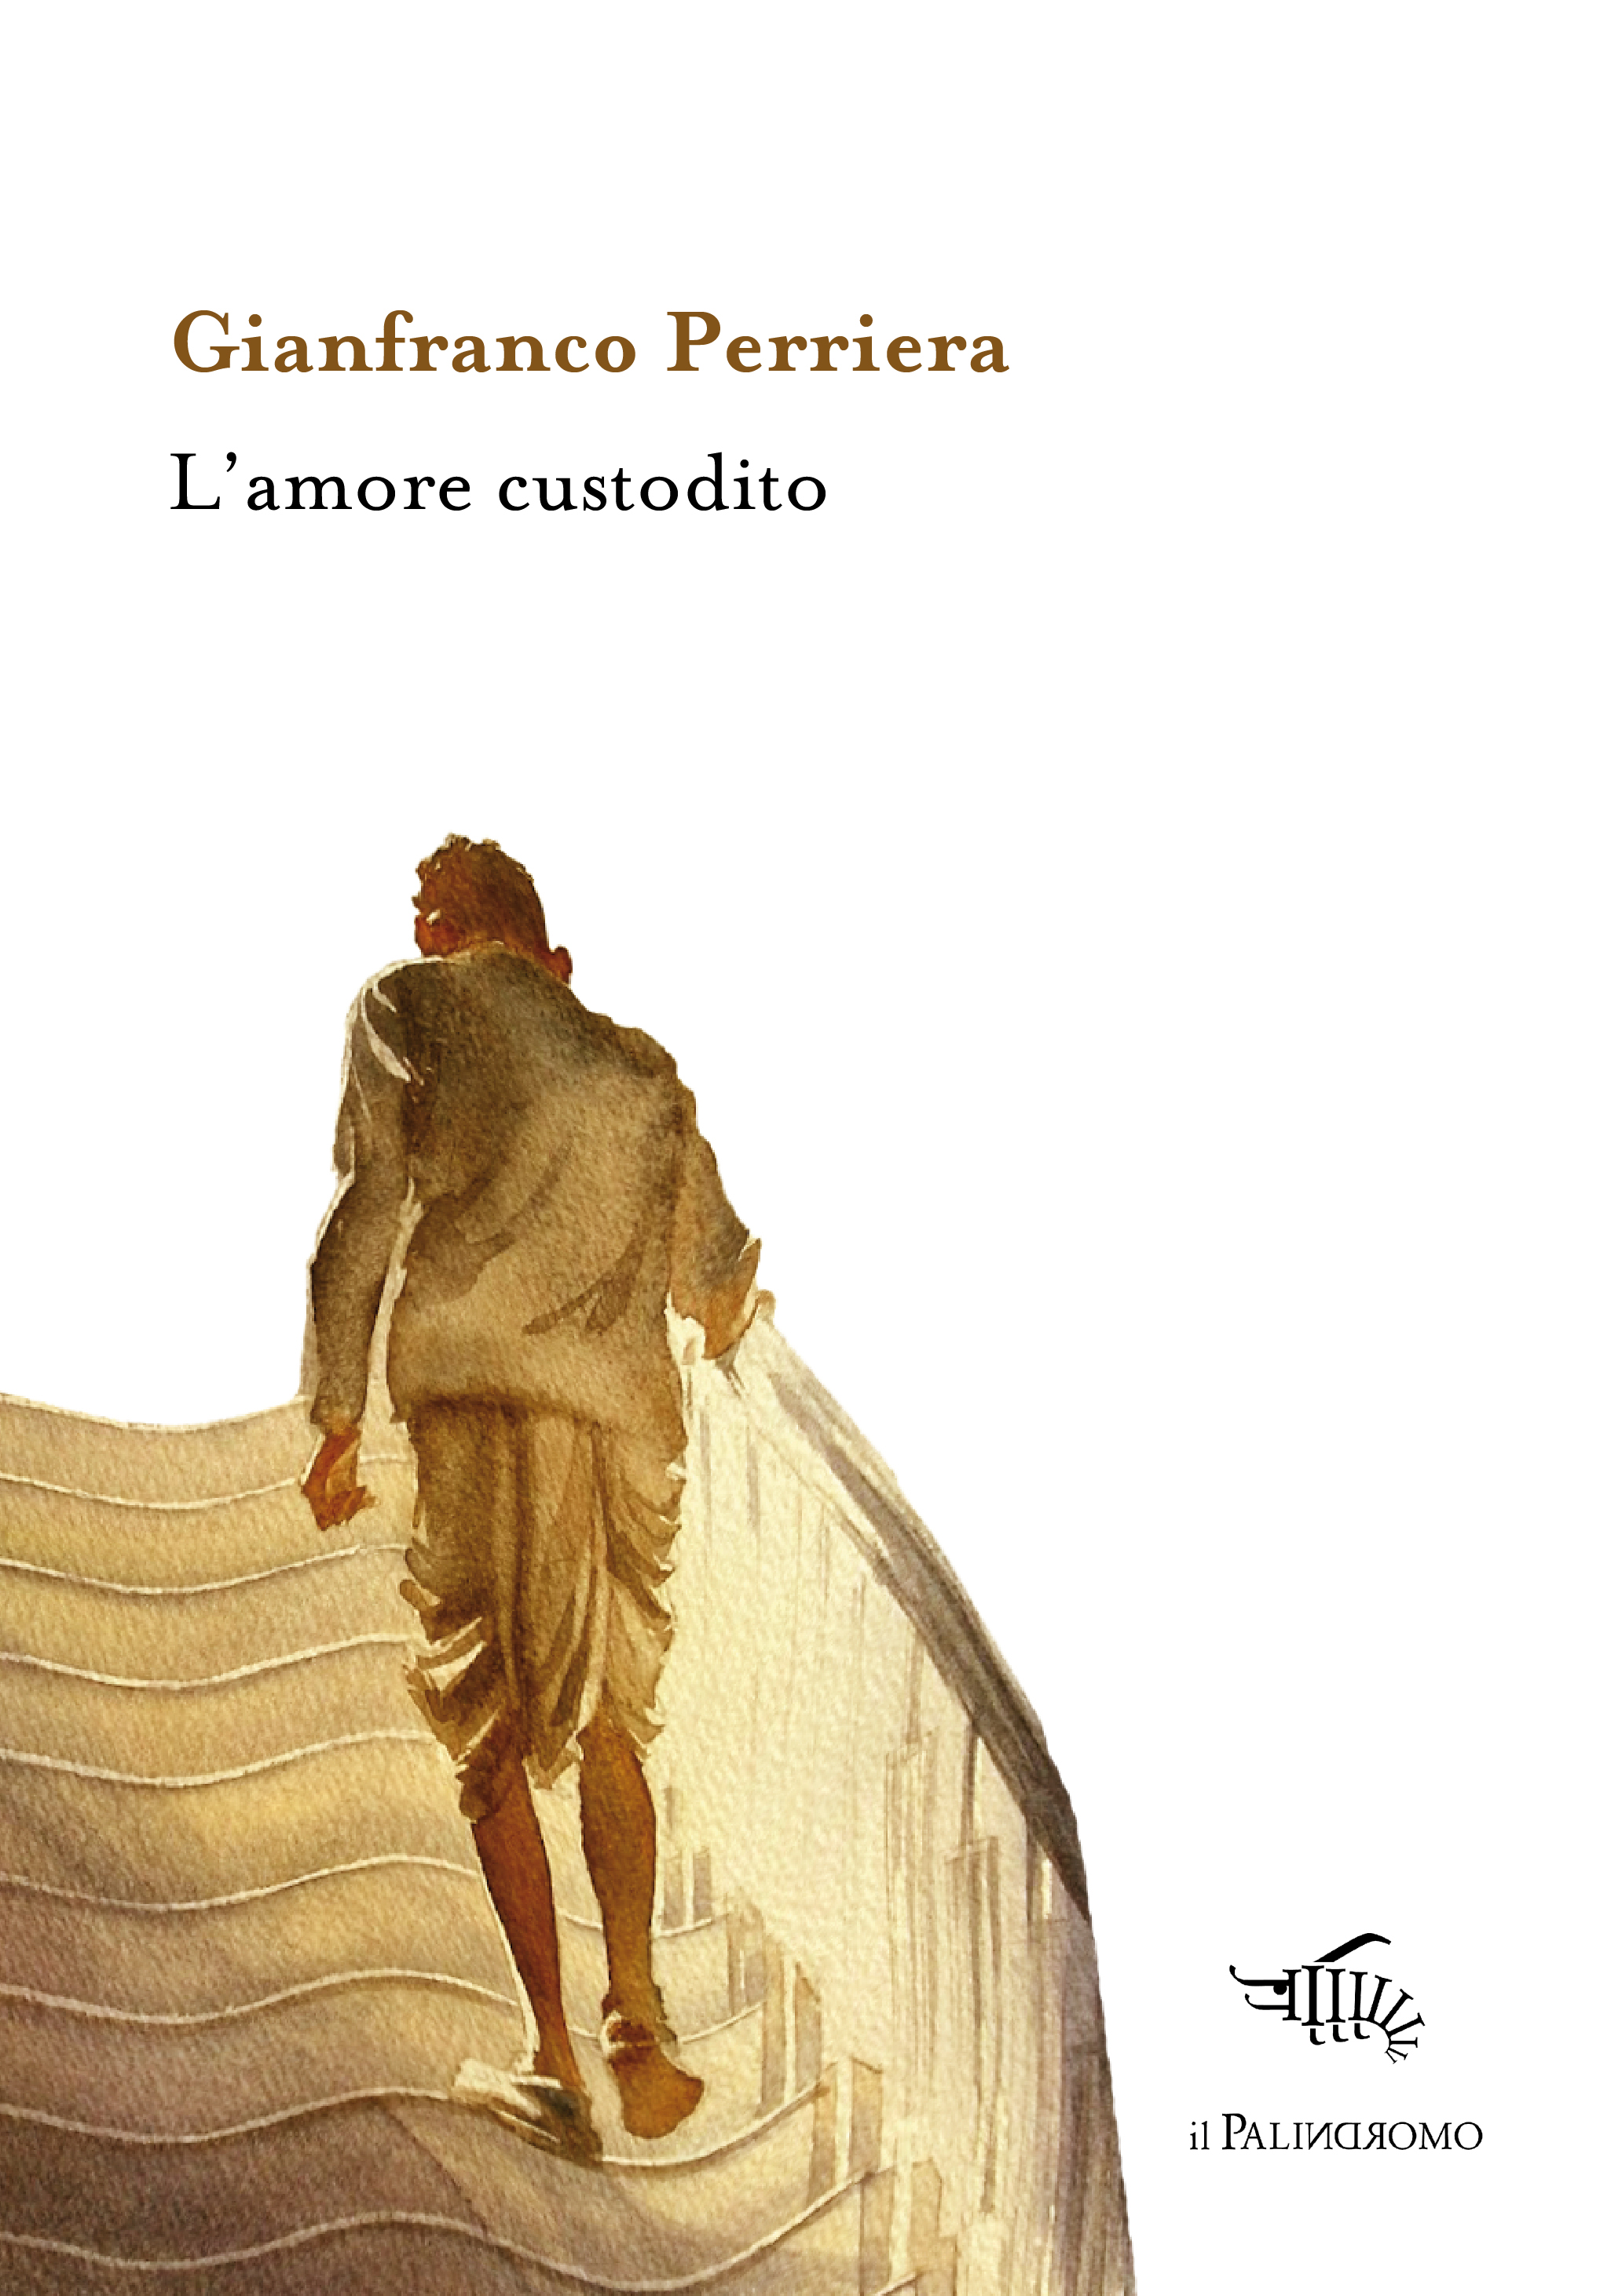 Autore: Gianfranco Perriera